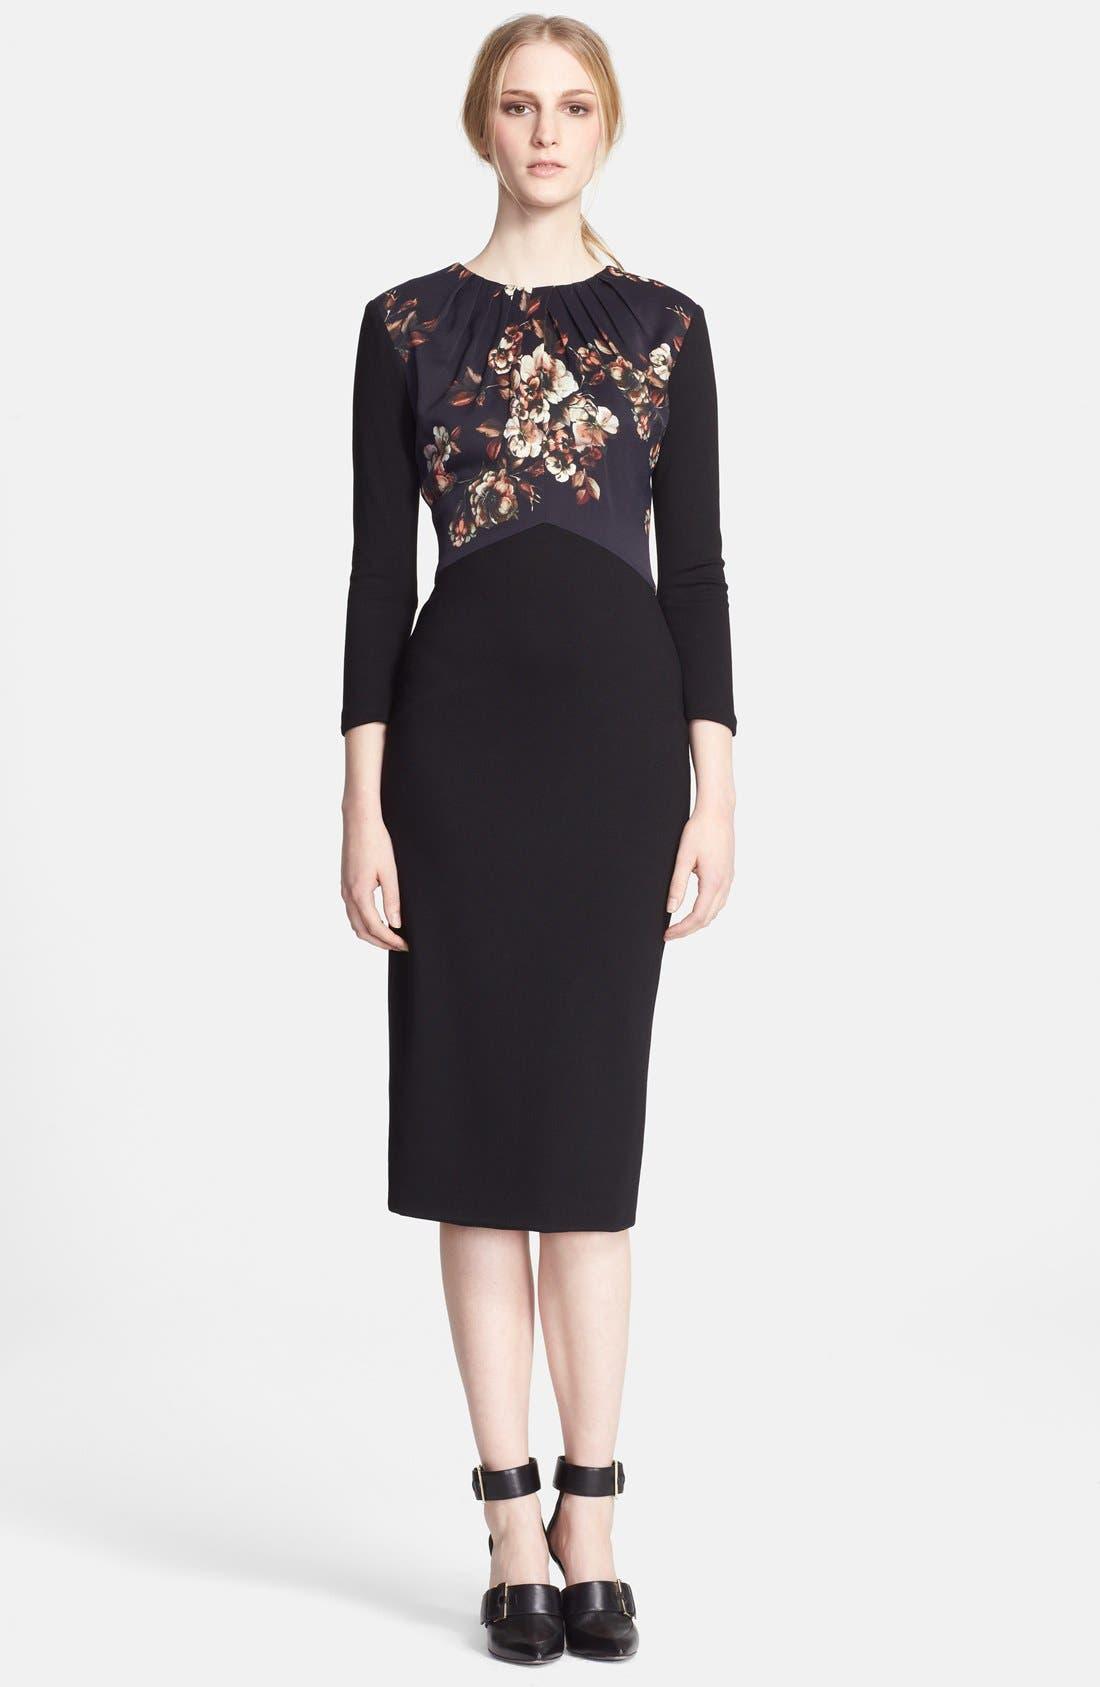 Alternate Image 1 Selected - Jason Wu Print Contrast Knit Midi Dress